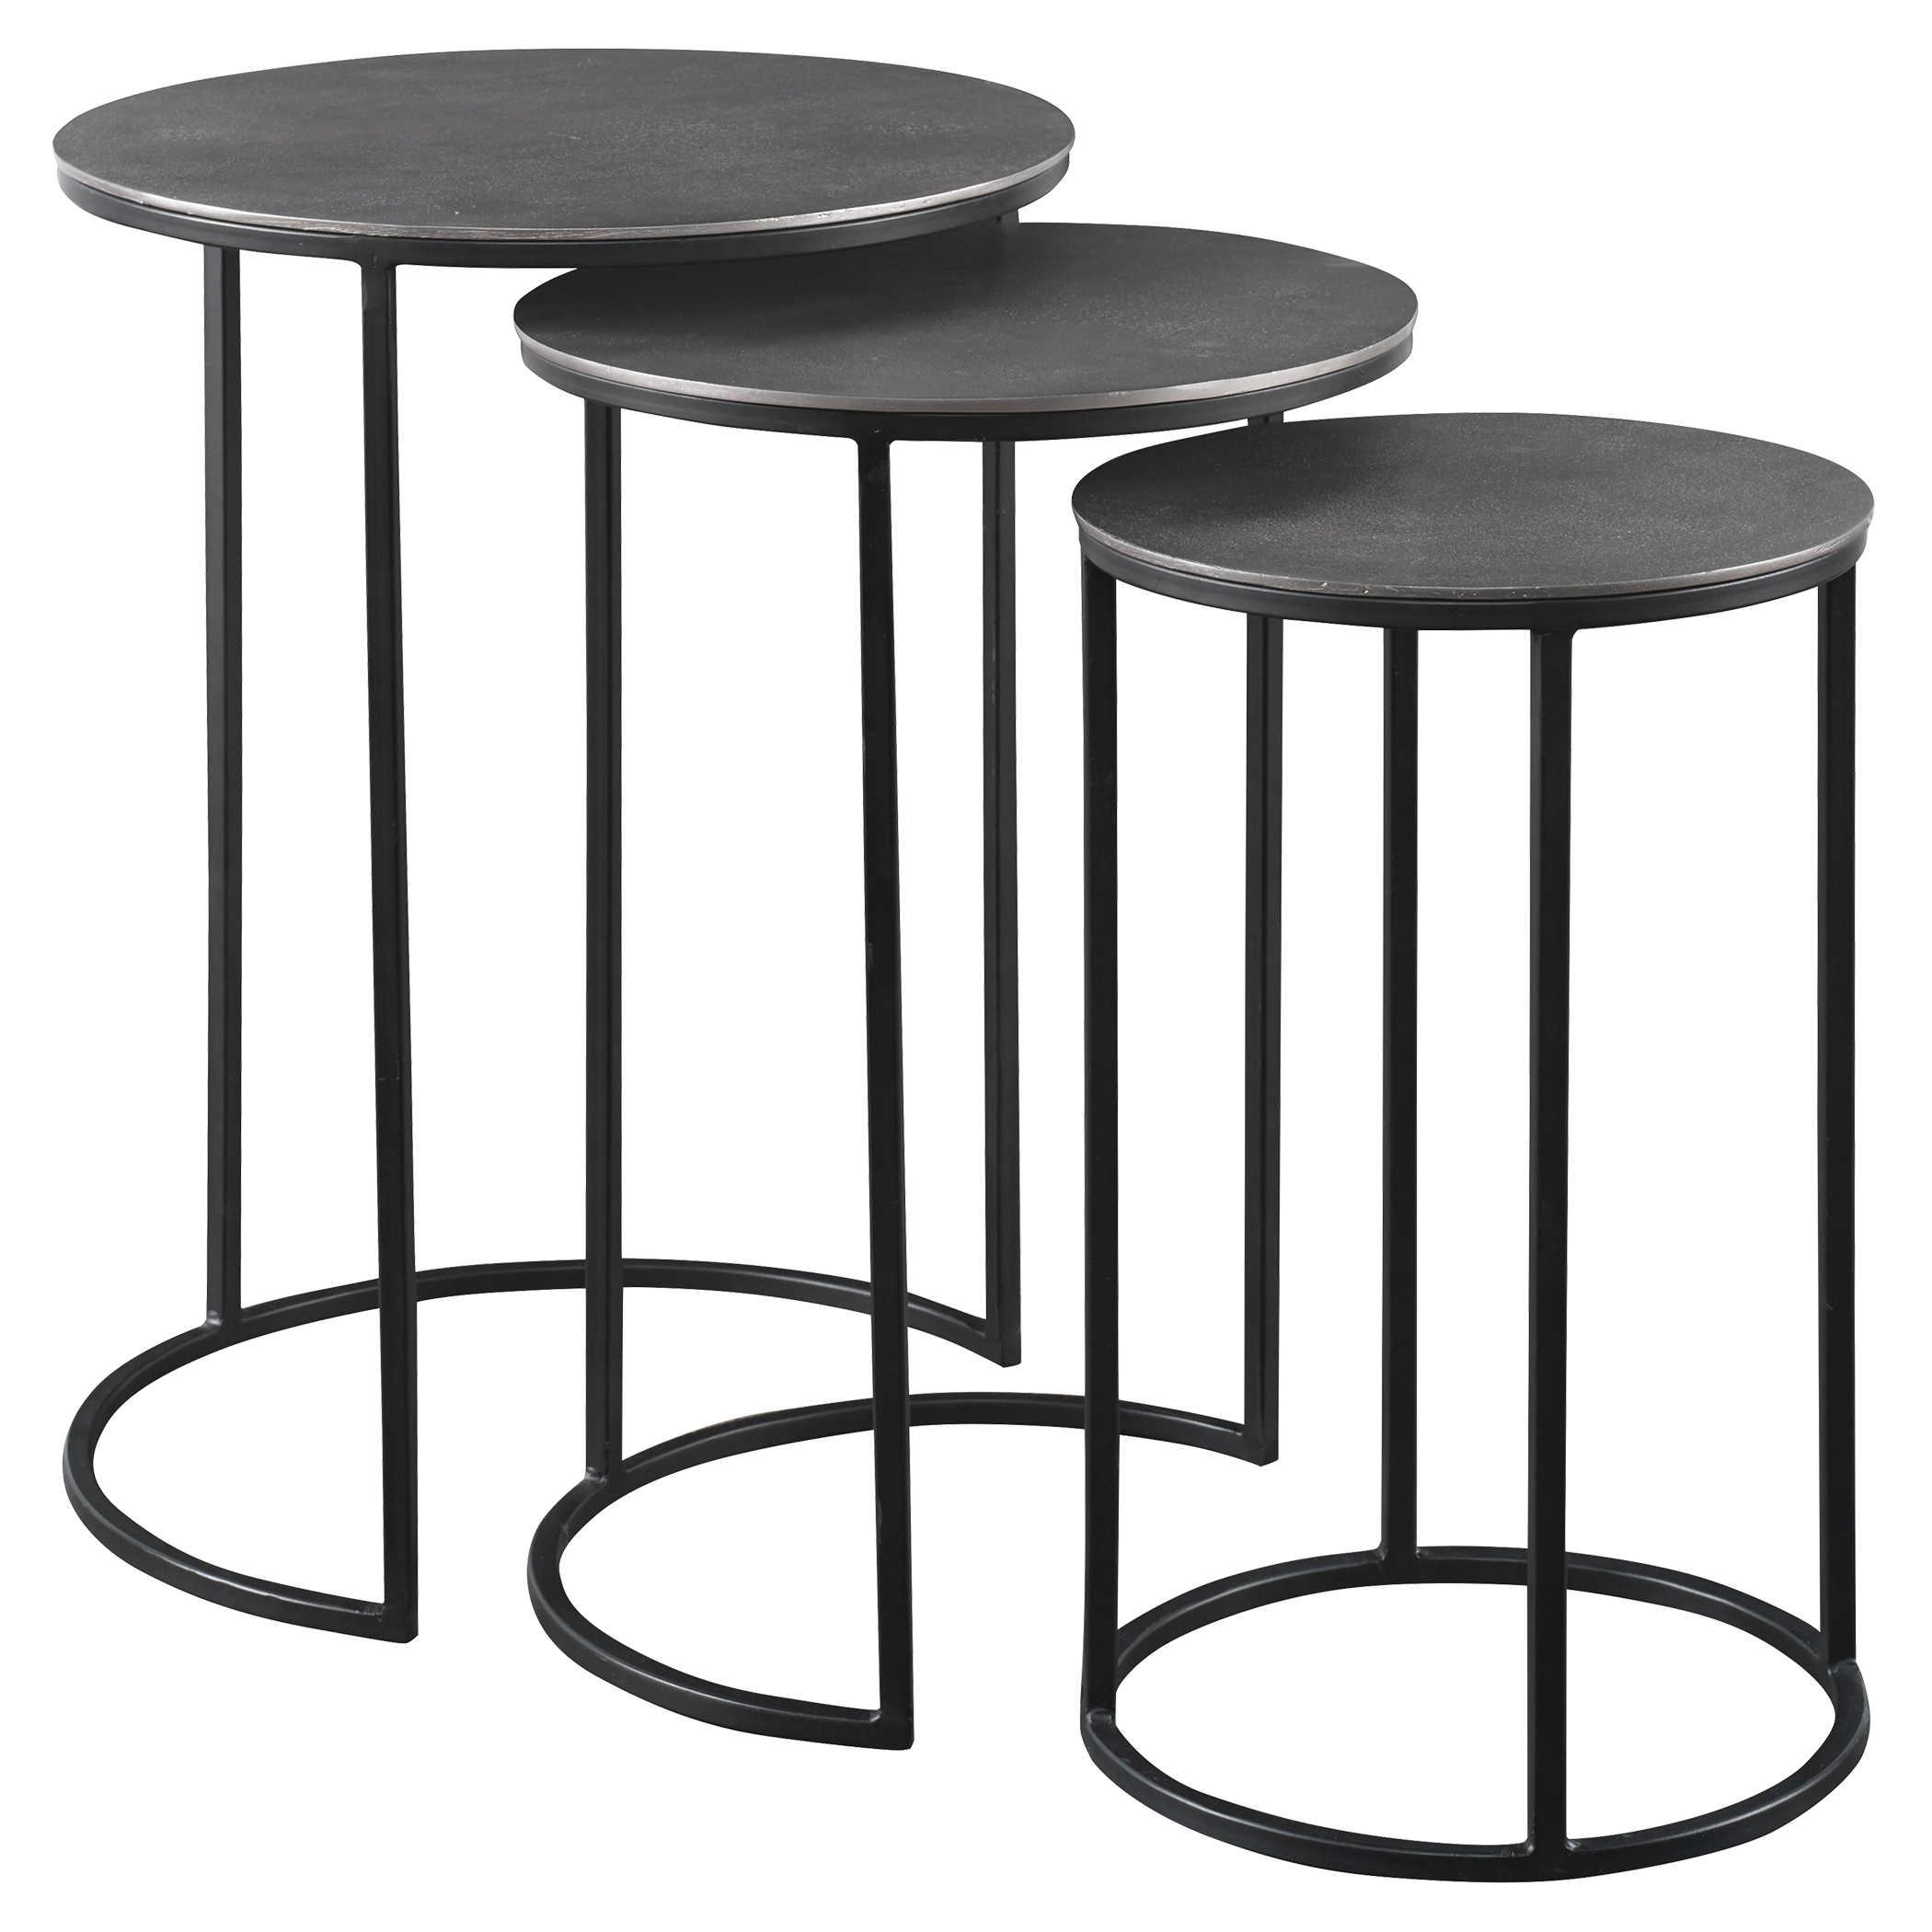 Alton Nesting Tables-$385.00